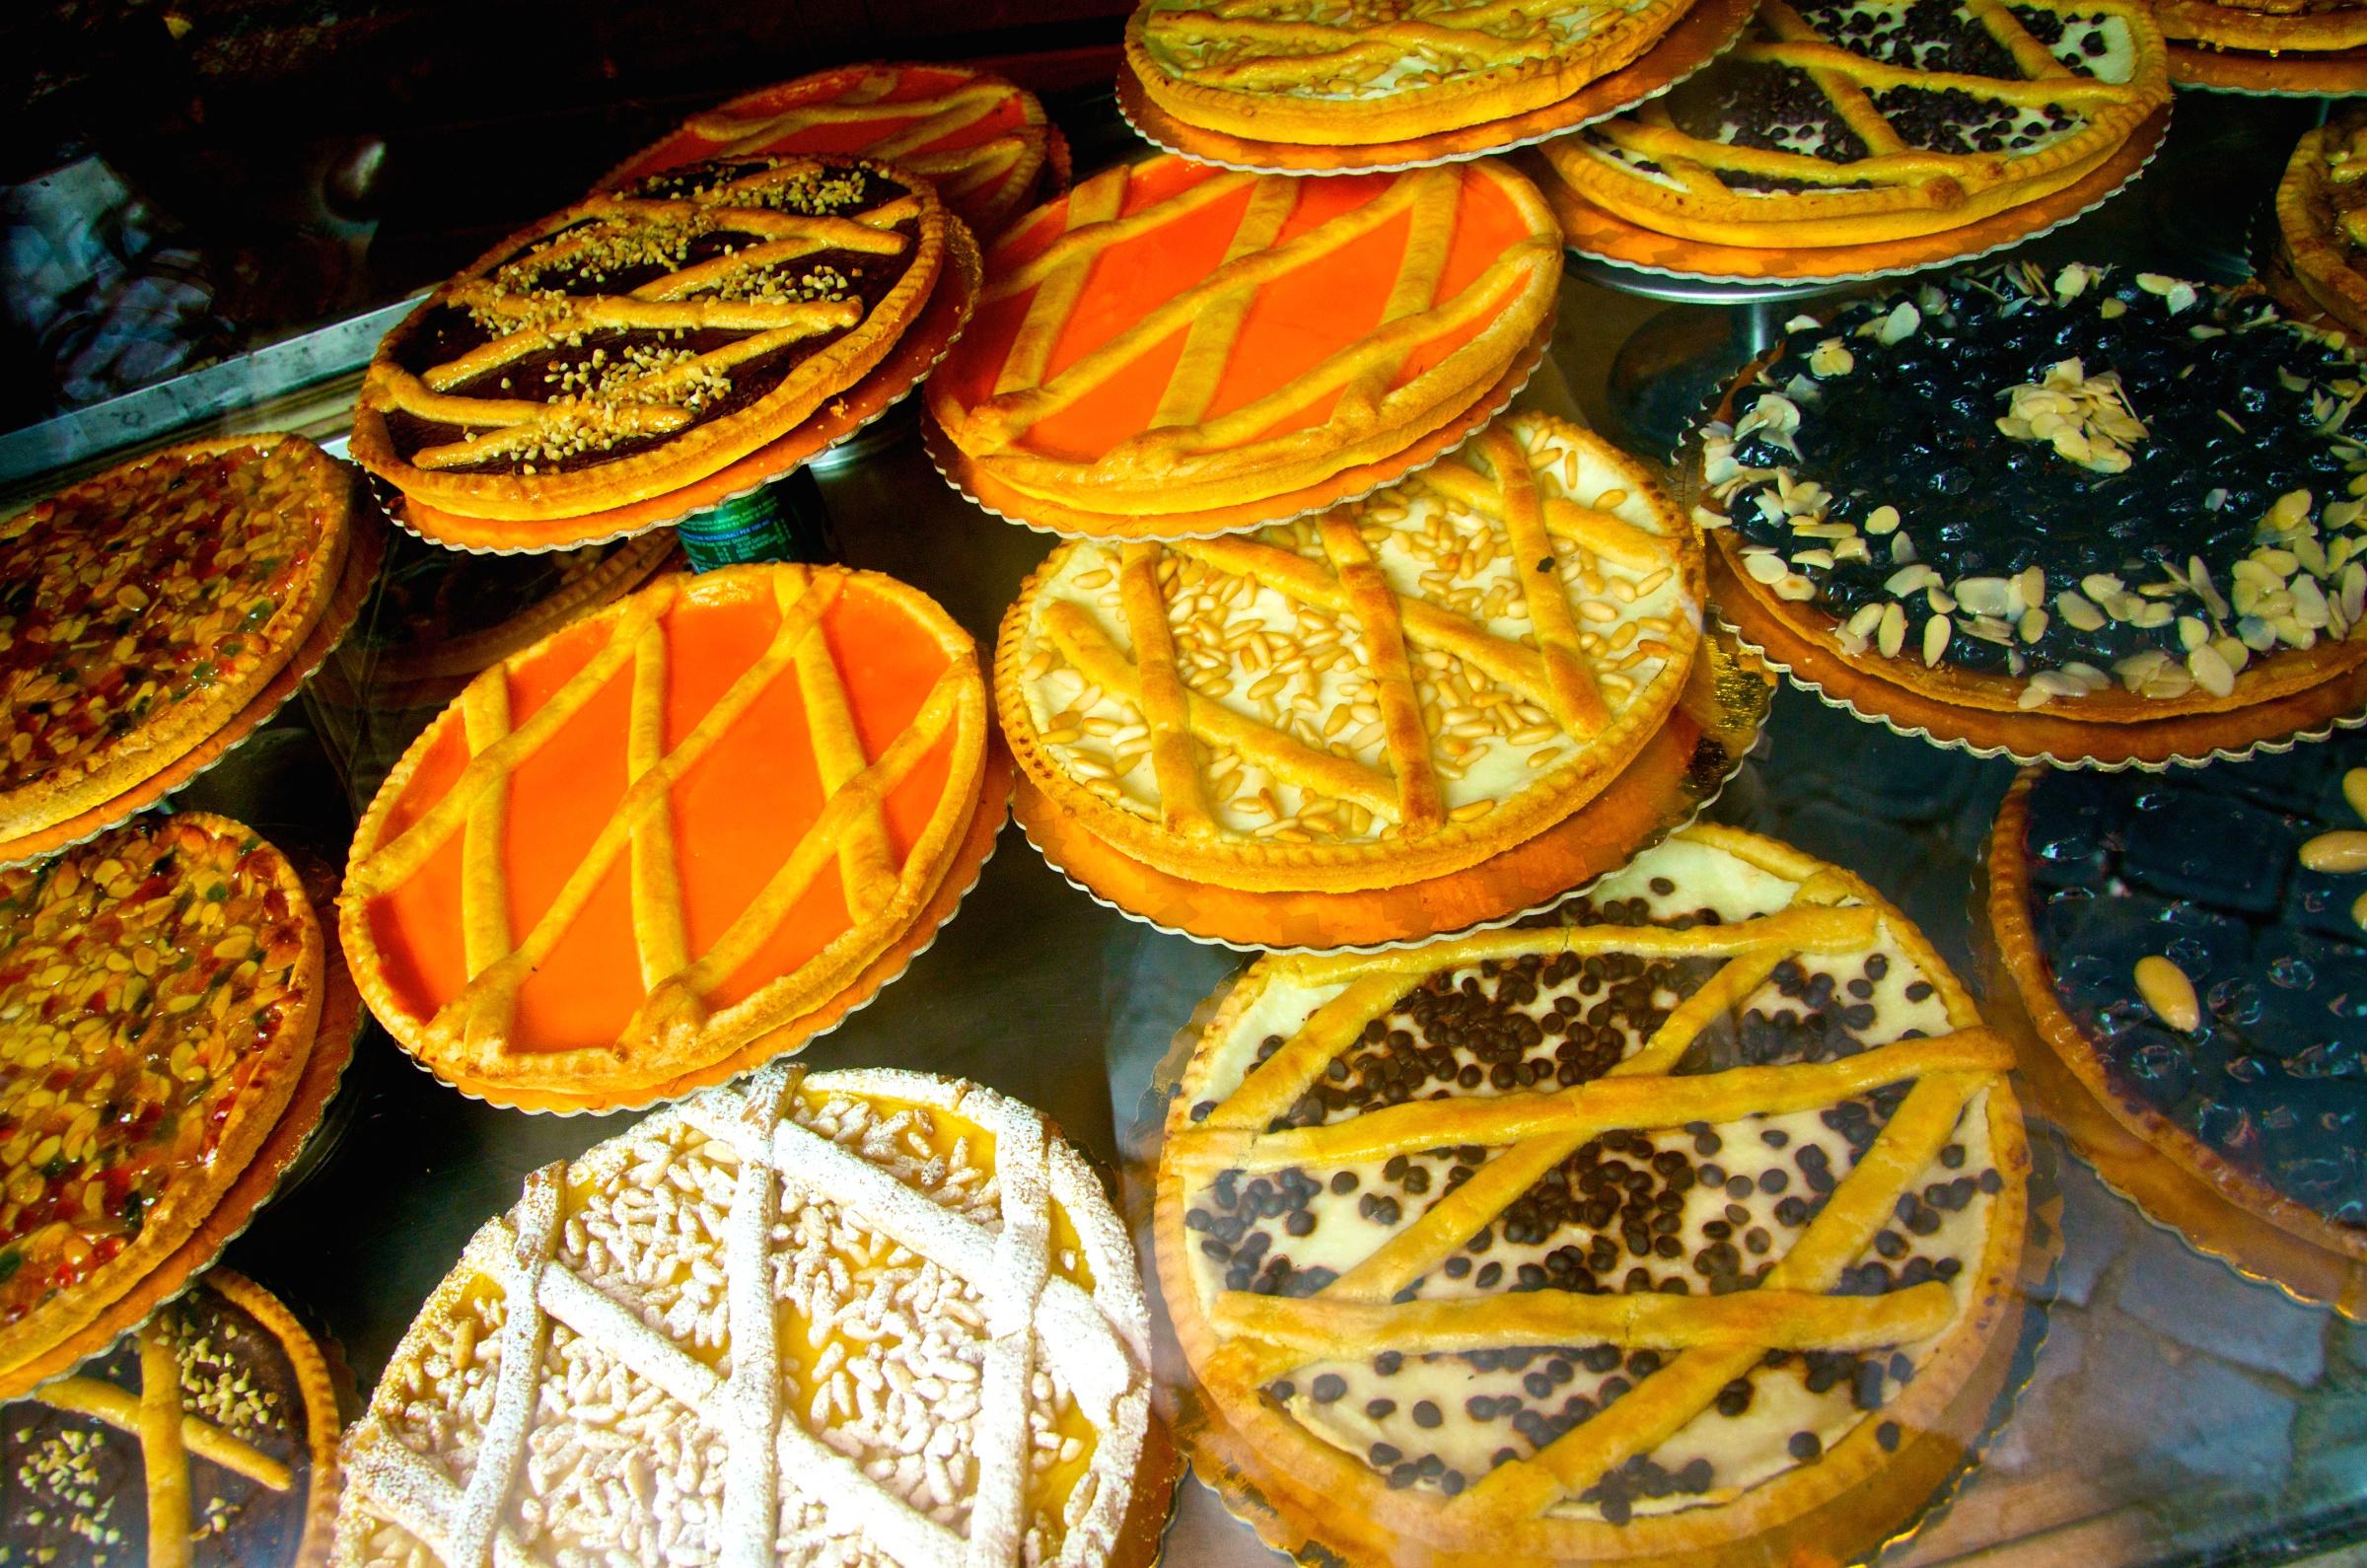 Italian Sweets - Homemade Pies